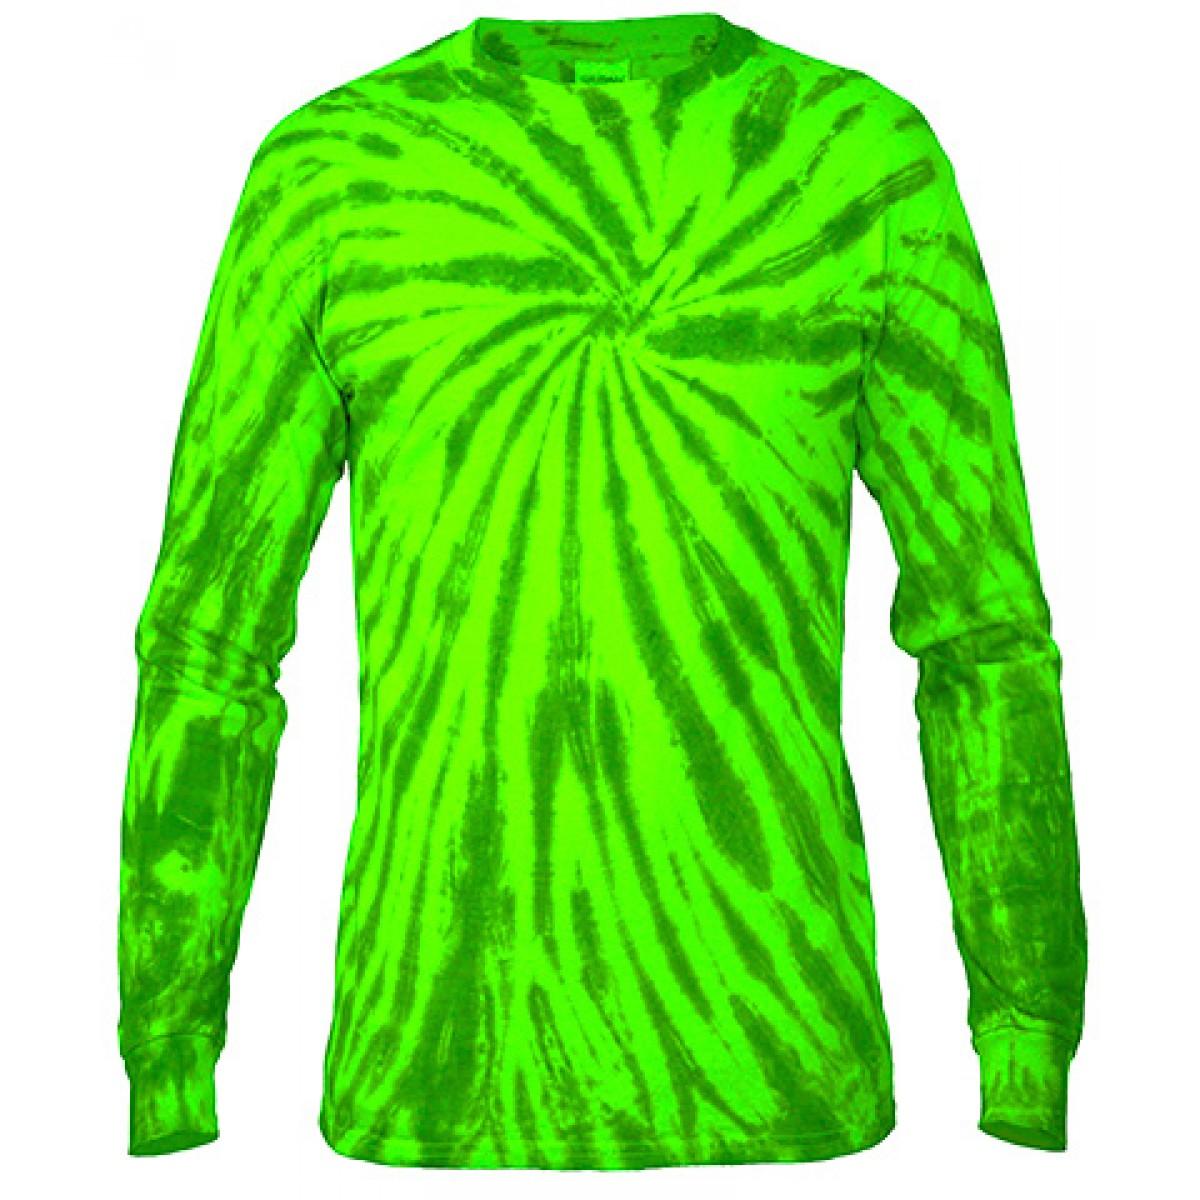 Multi Color Tie-Dye Long Sleeve Shirt -Green-M